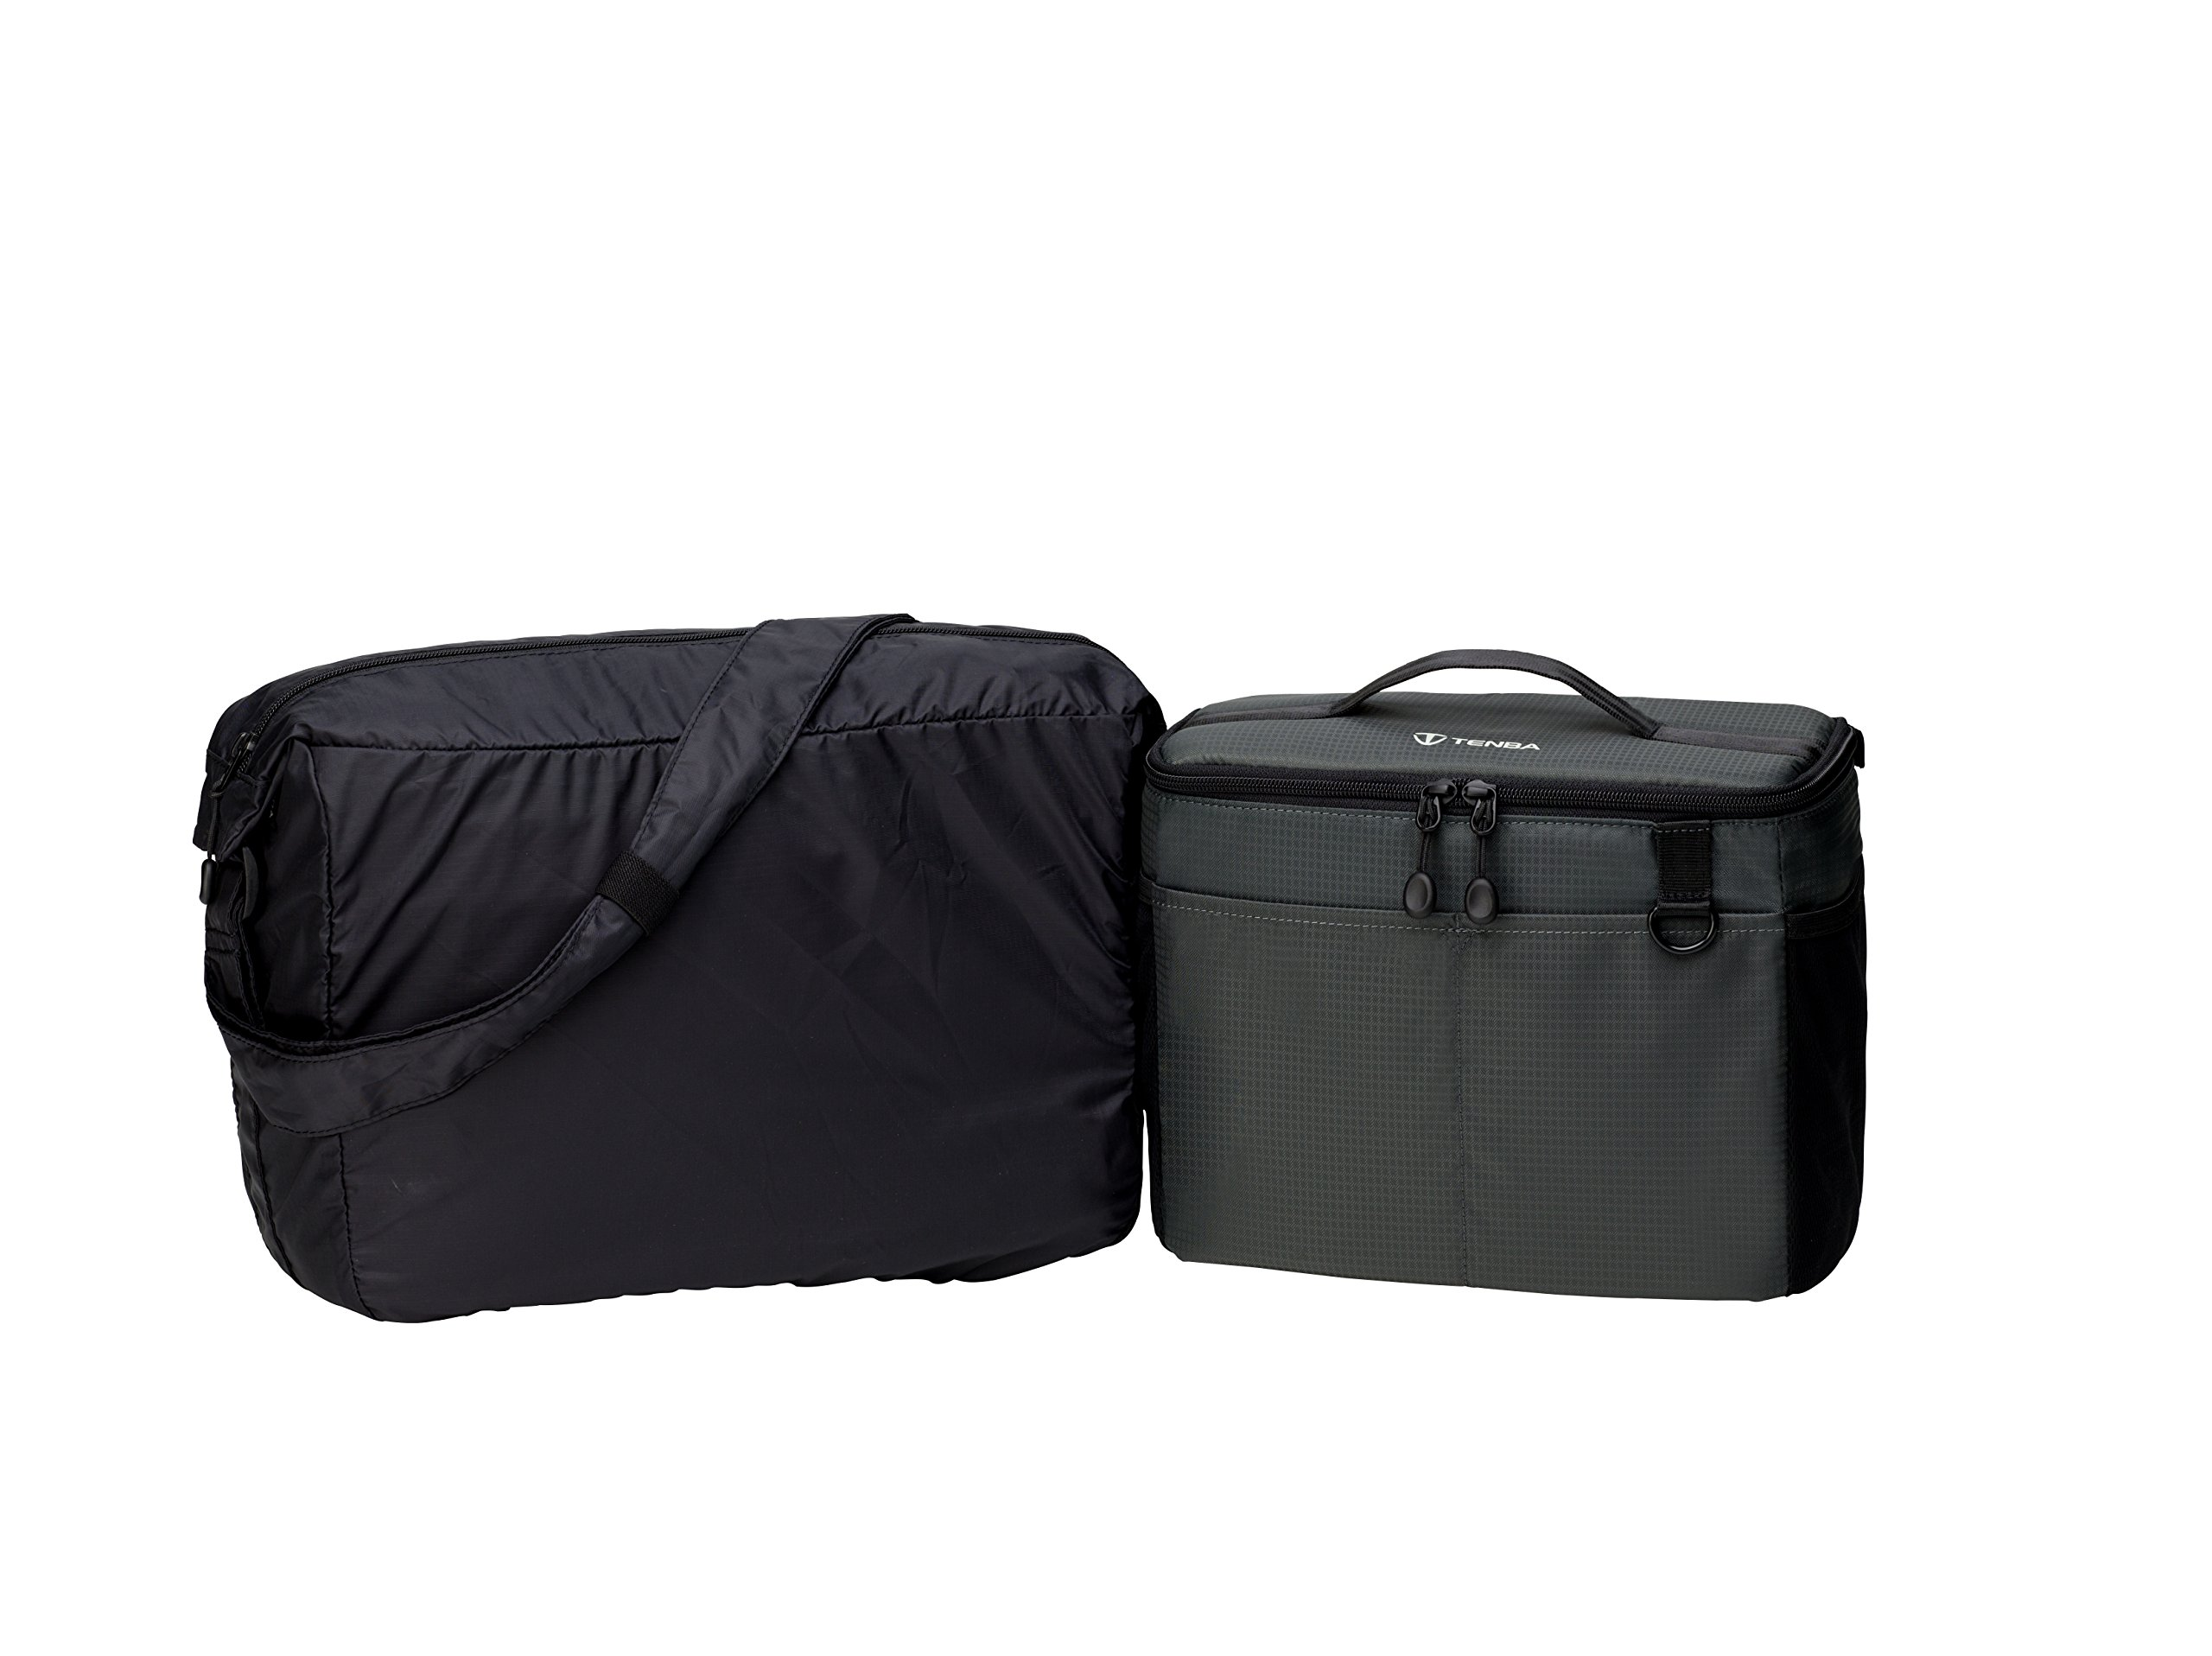 Tenba BYOB/Packlite 10 Flatpack Bundle with Insert and Packlite Bag (636-283) by Tenba